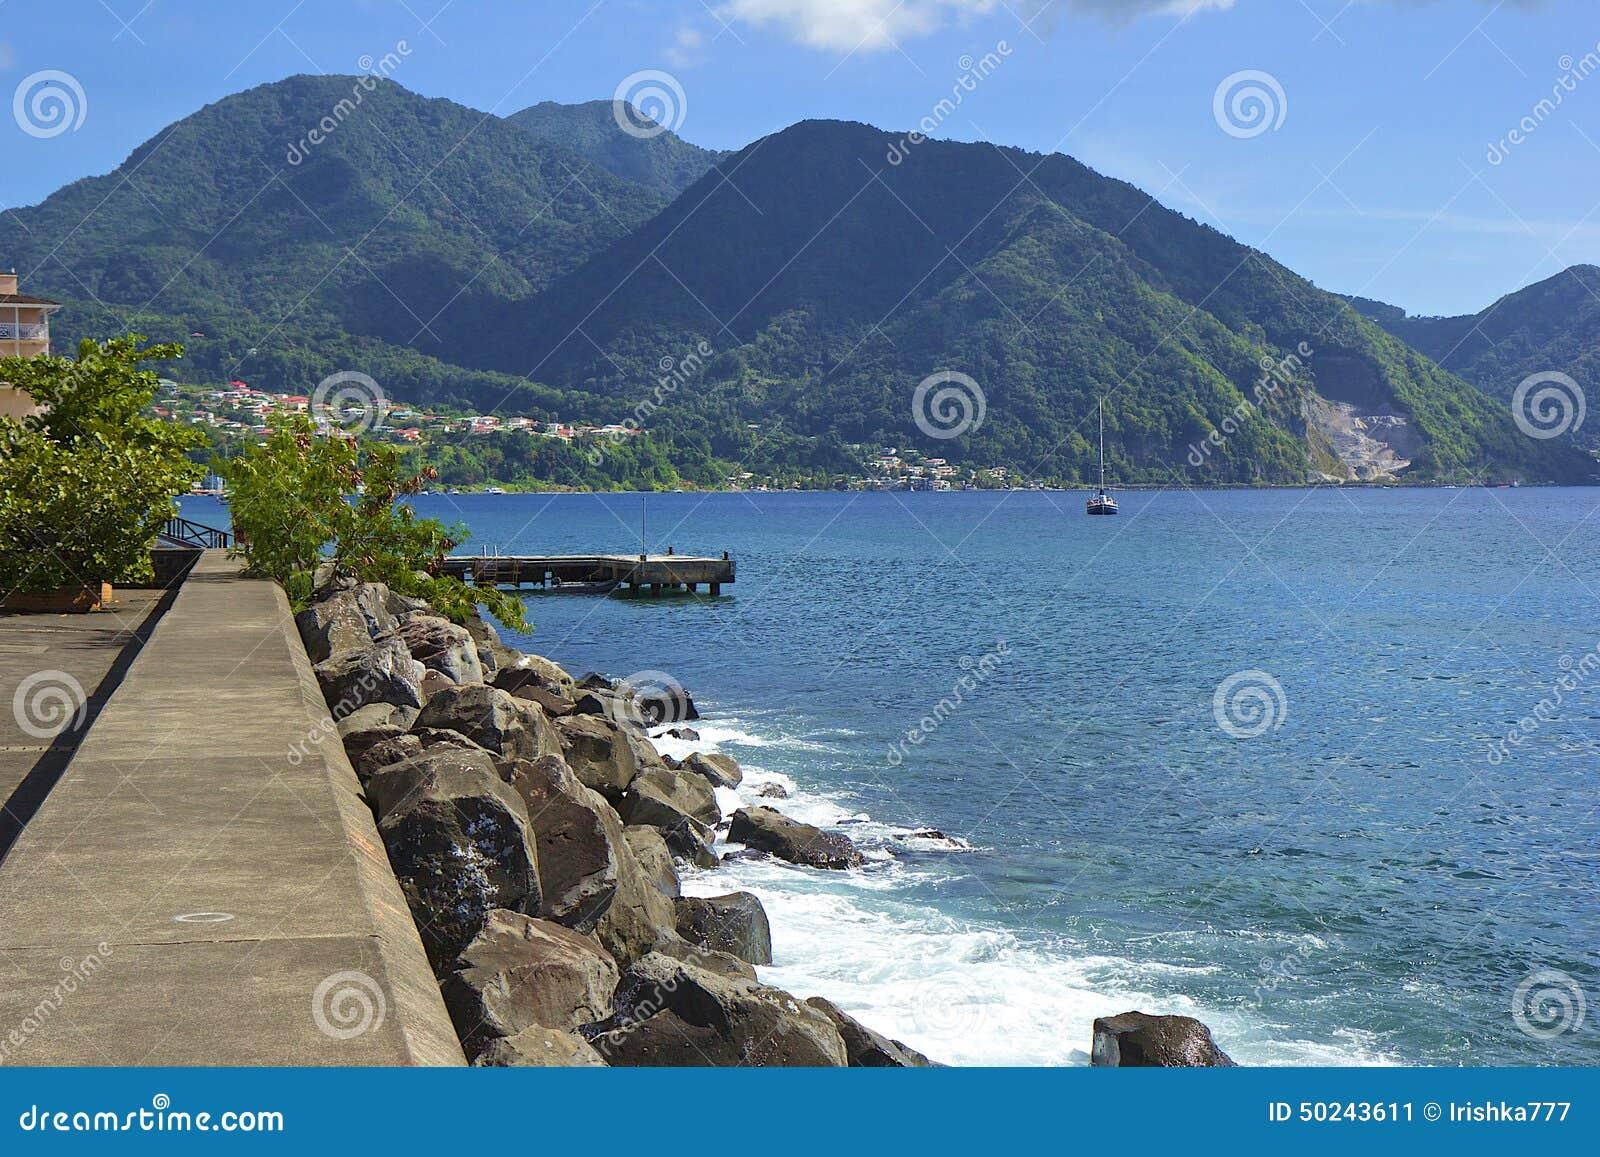 Lungomare di Roseau in Dominica, caraibica